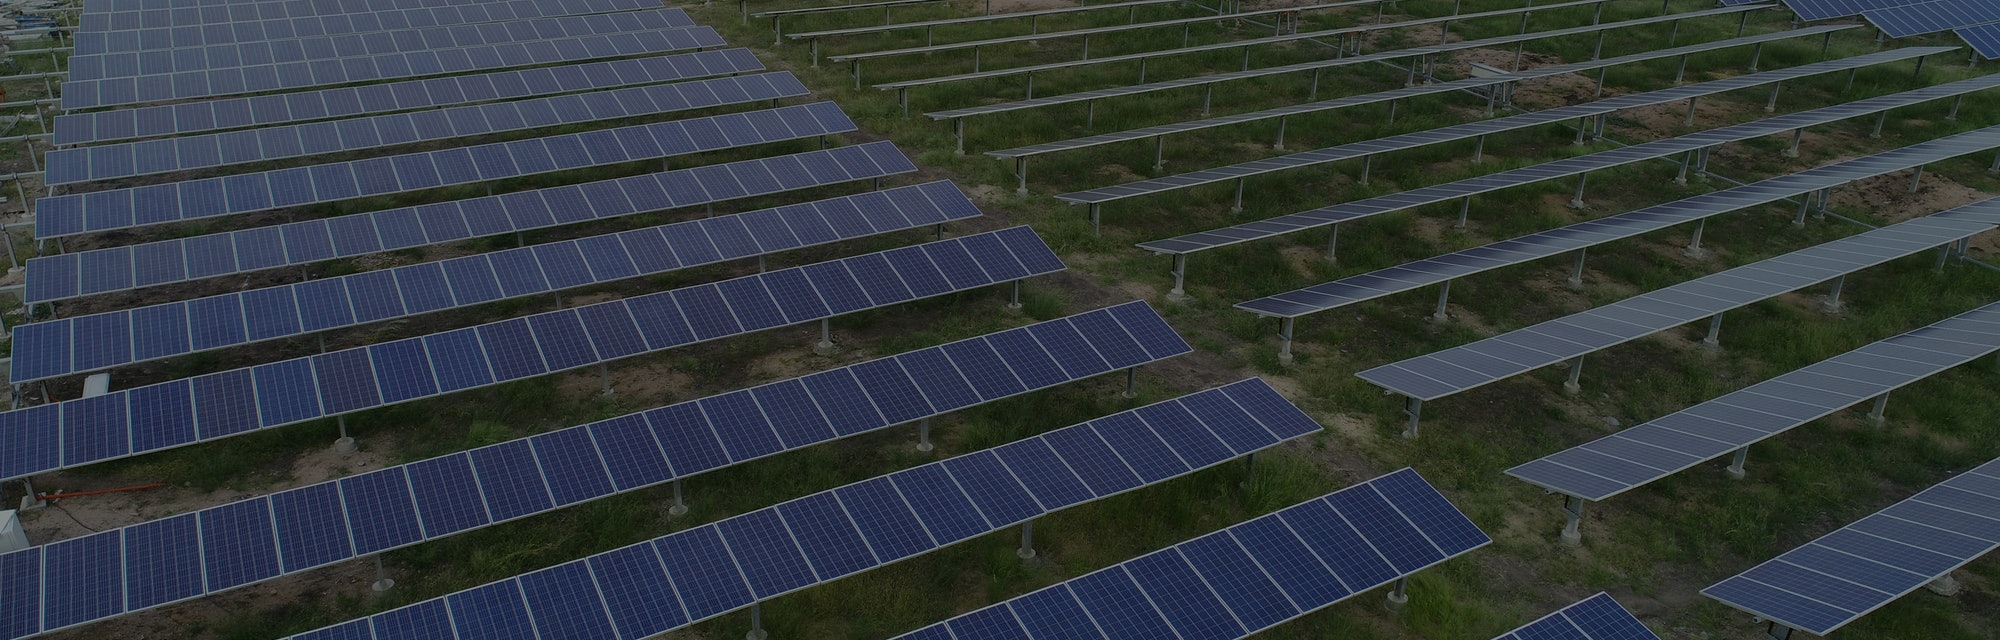 Aerial View of solar farm or solar power plant near Raichur, India